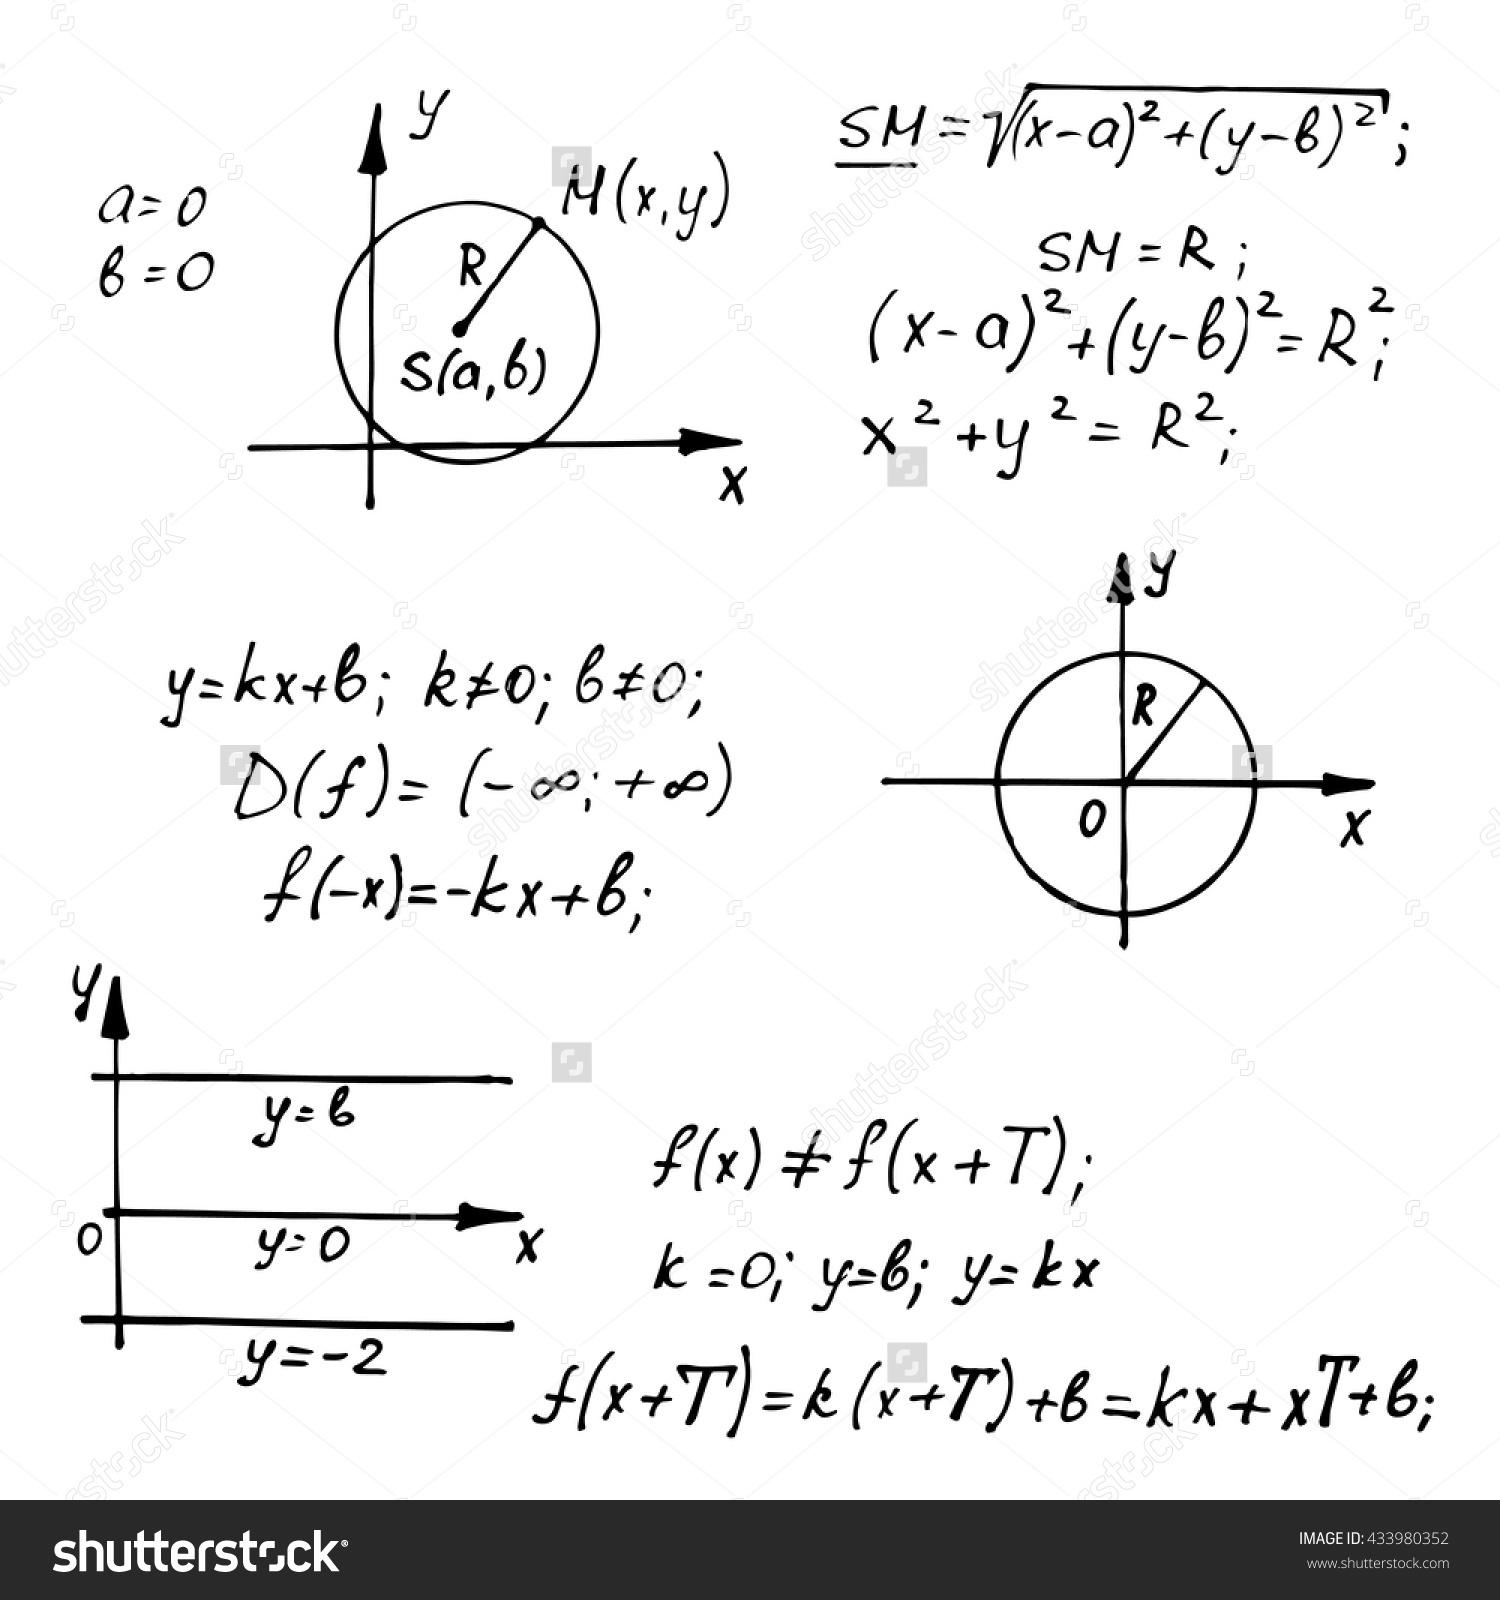 Carbs Are Bad Math Is Hard Carla Golden